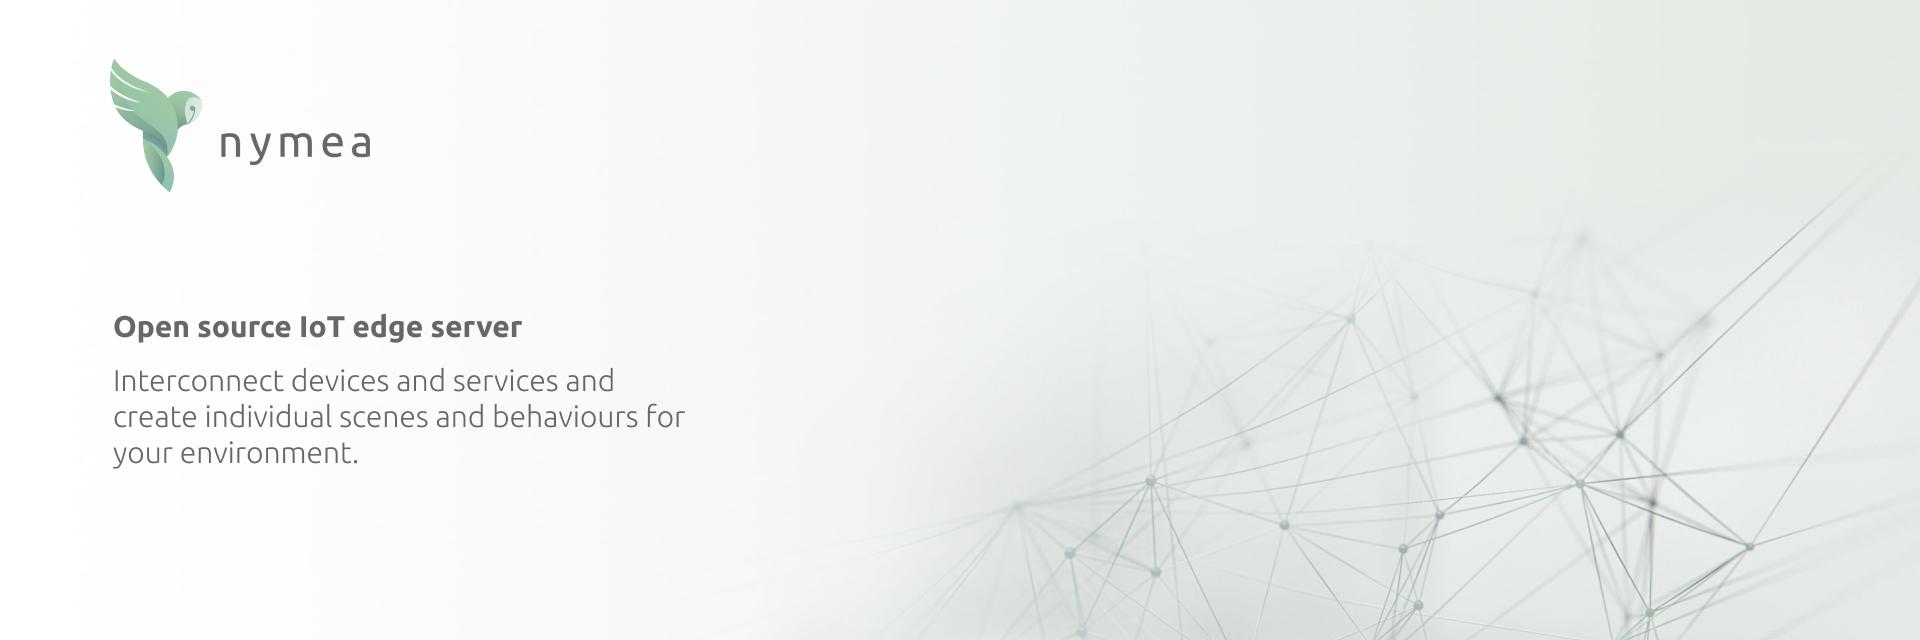 nymea:app banner